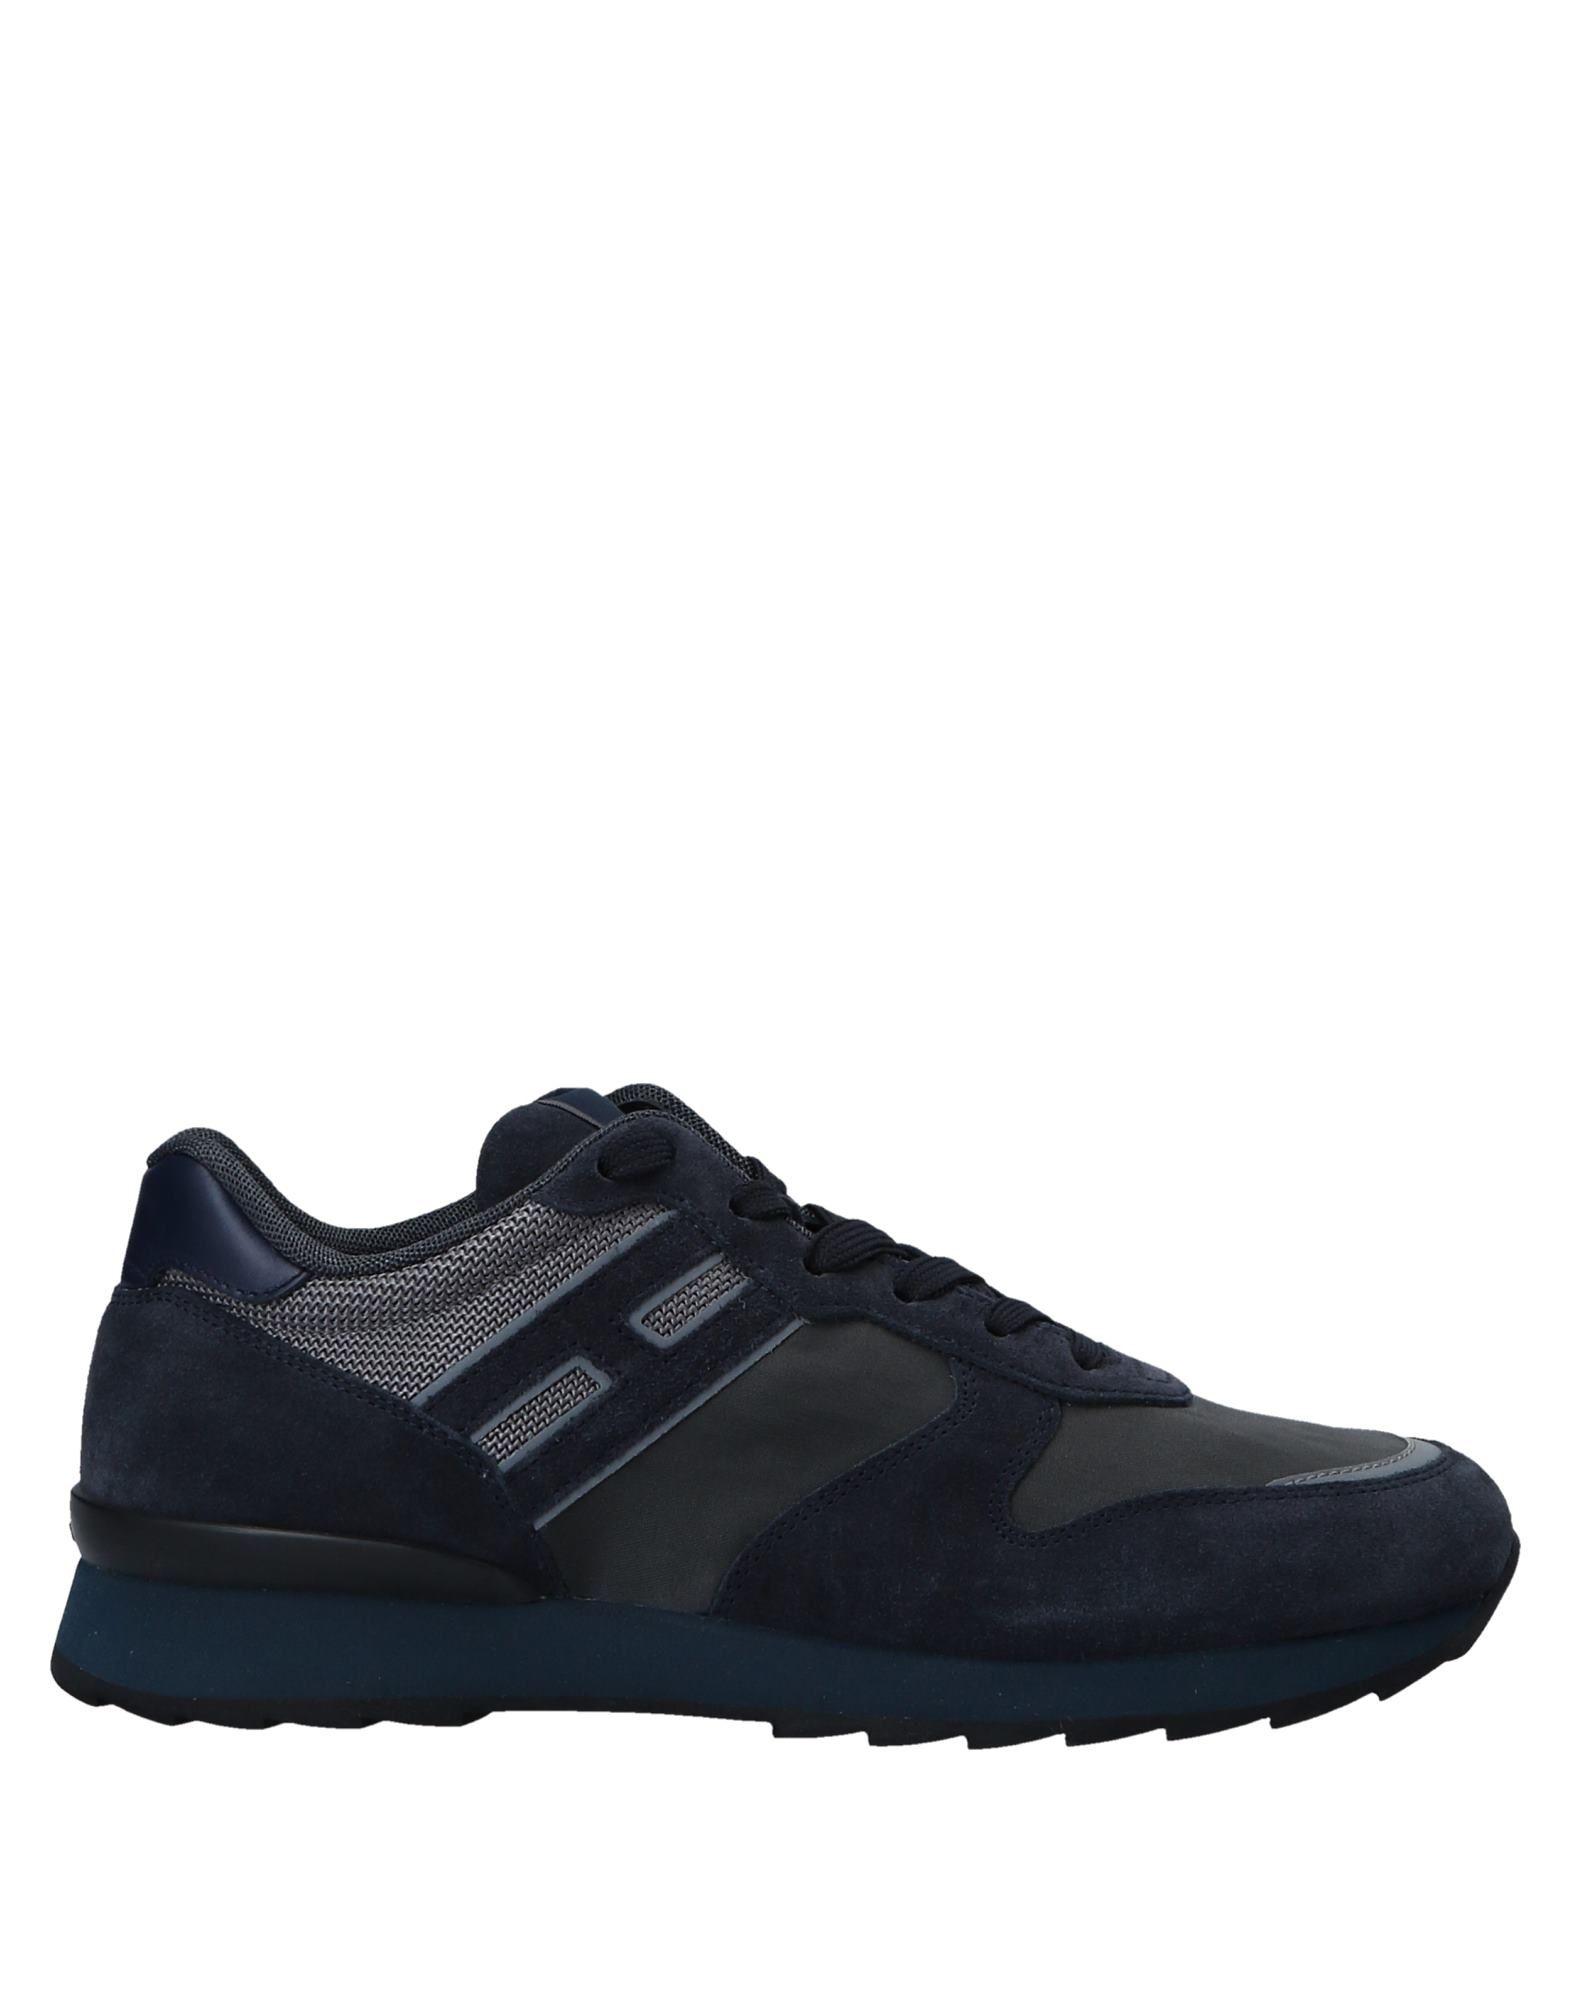 Hogan Sneakers Herren  11560063JB Gute Qualität beliebte Schuhe